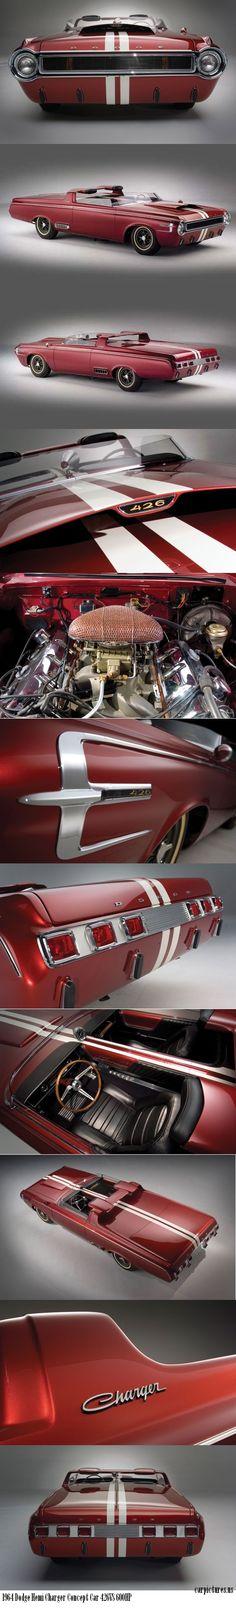 1964 Dodge Hemi Charger Concept Car 600HP